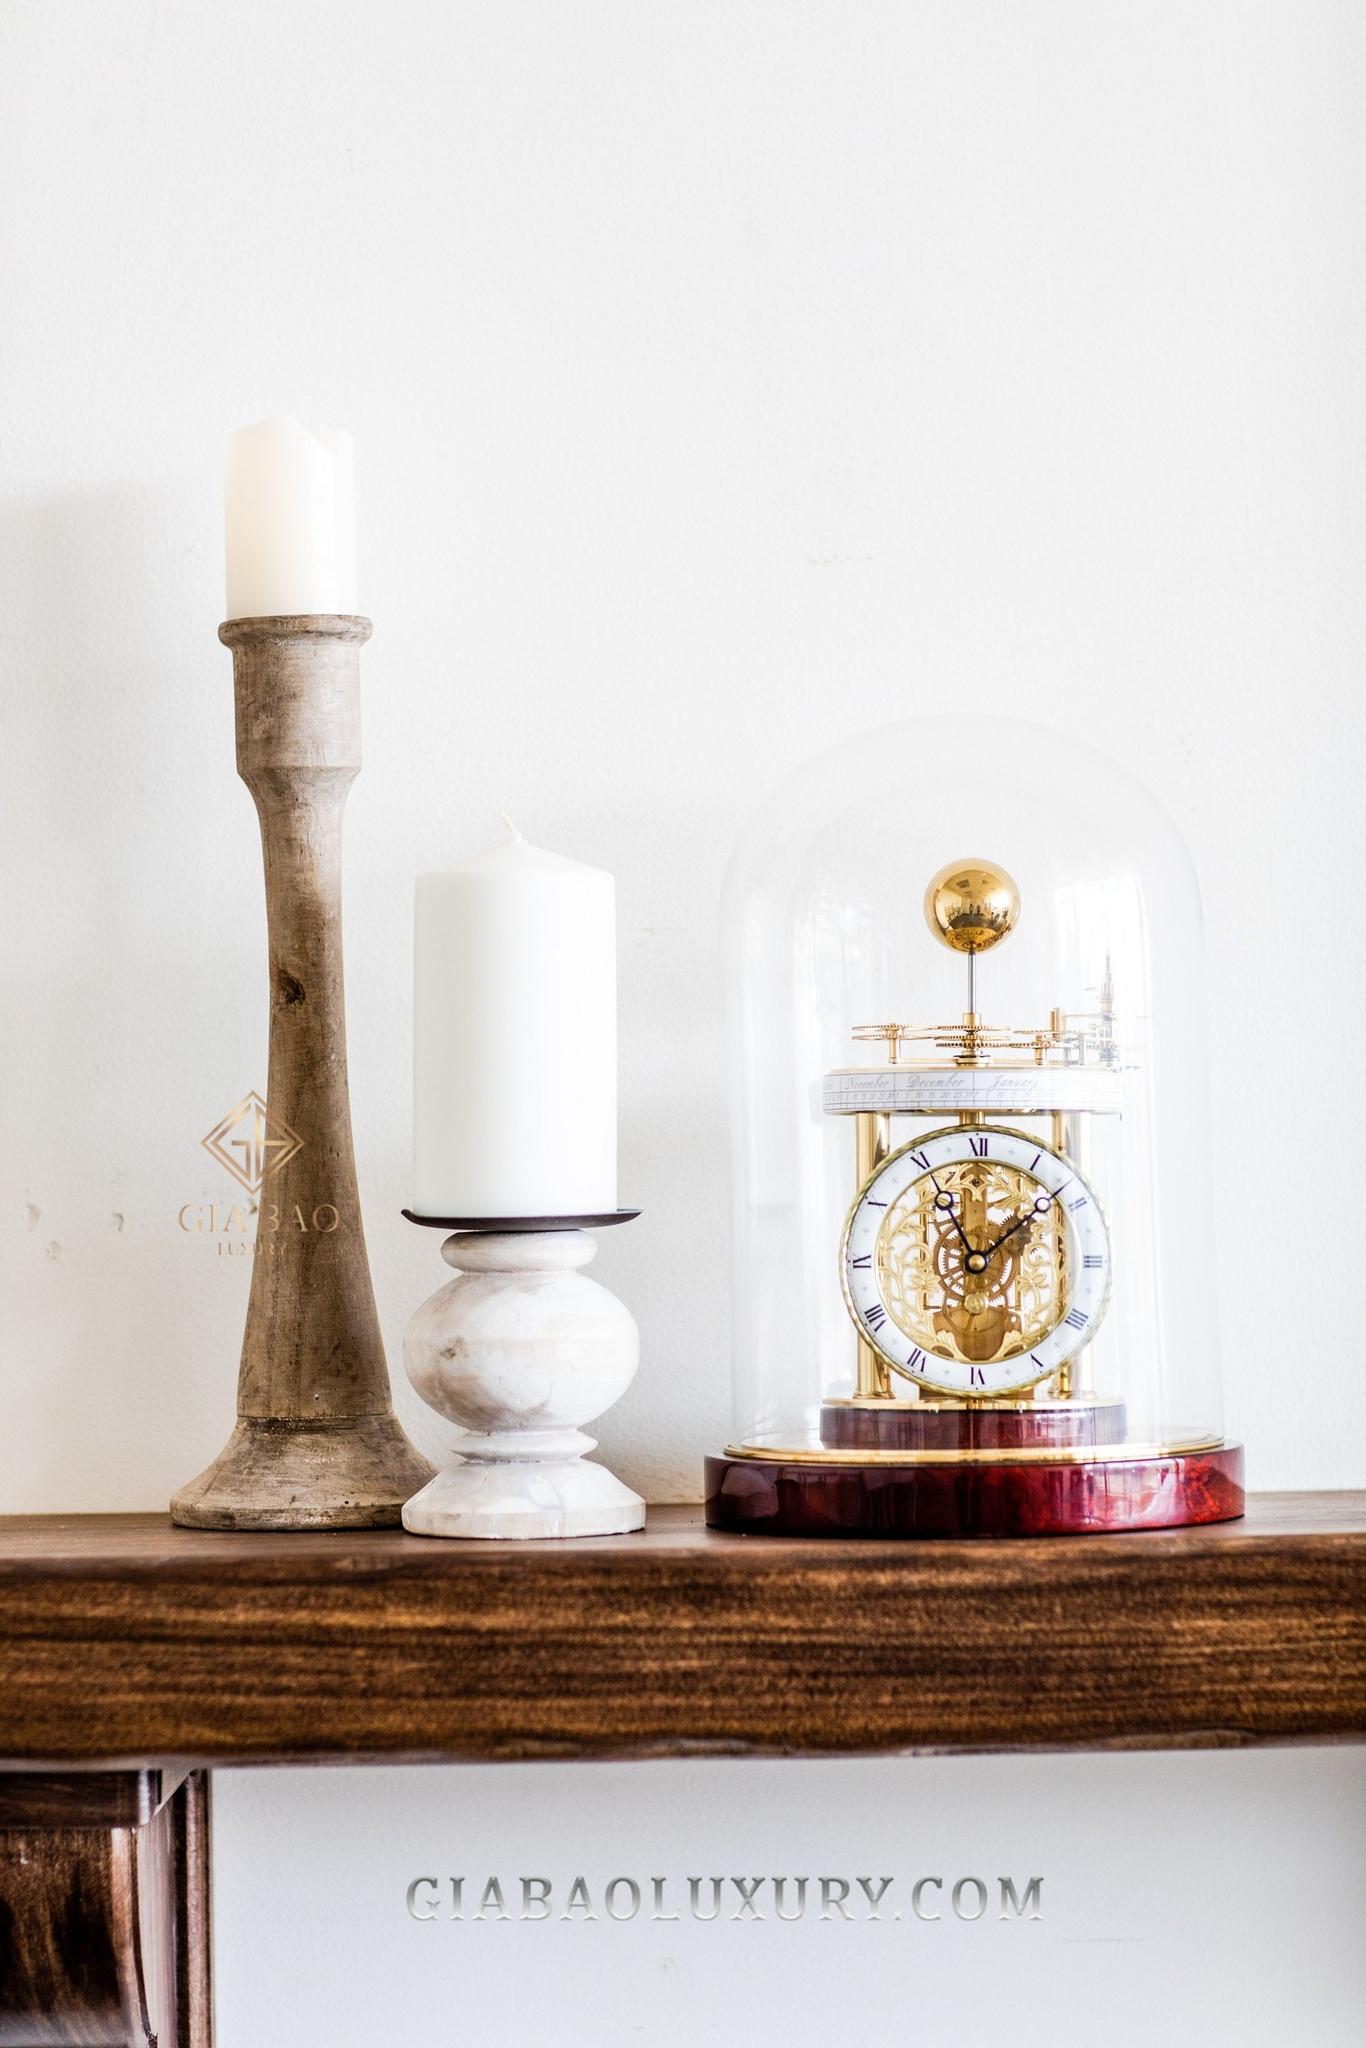 Đồng hồ Hermle